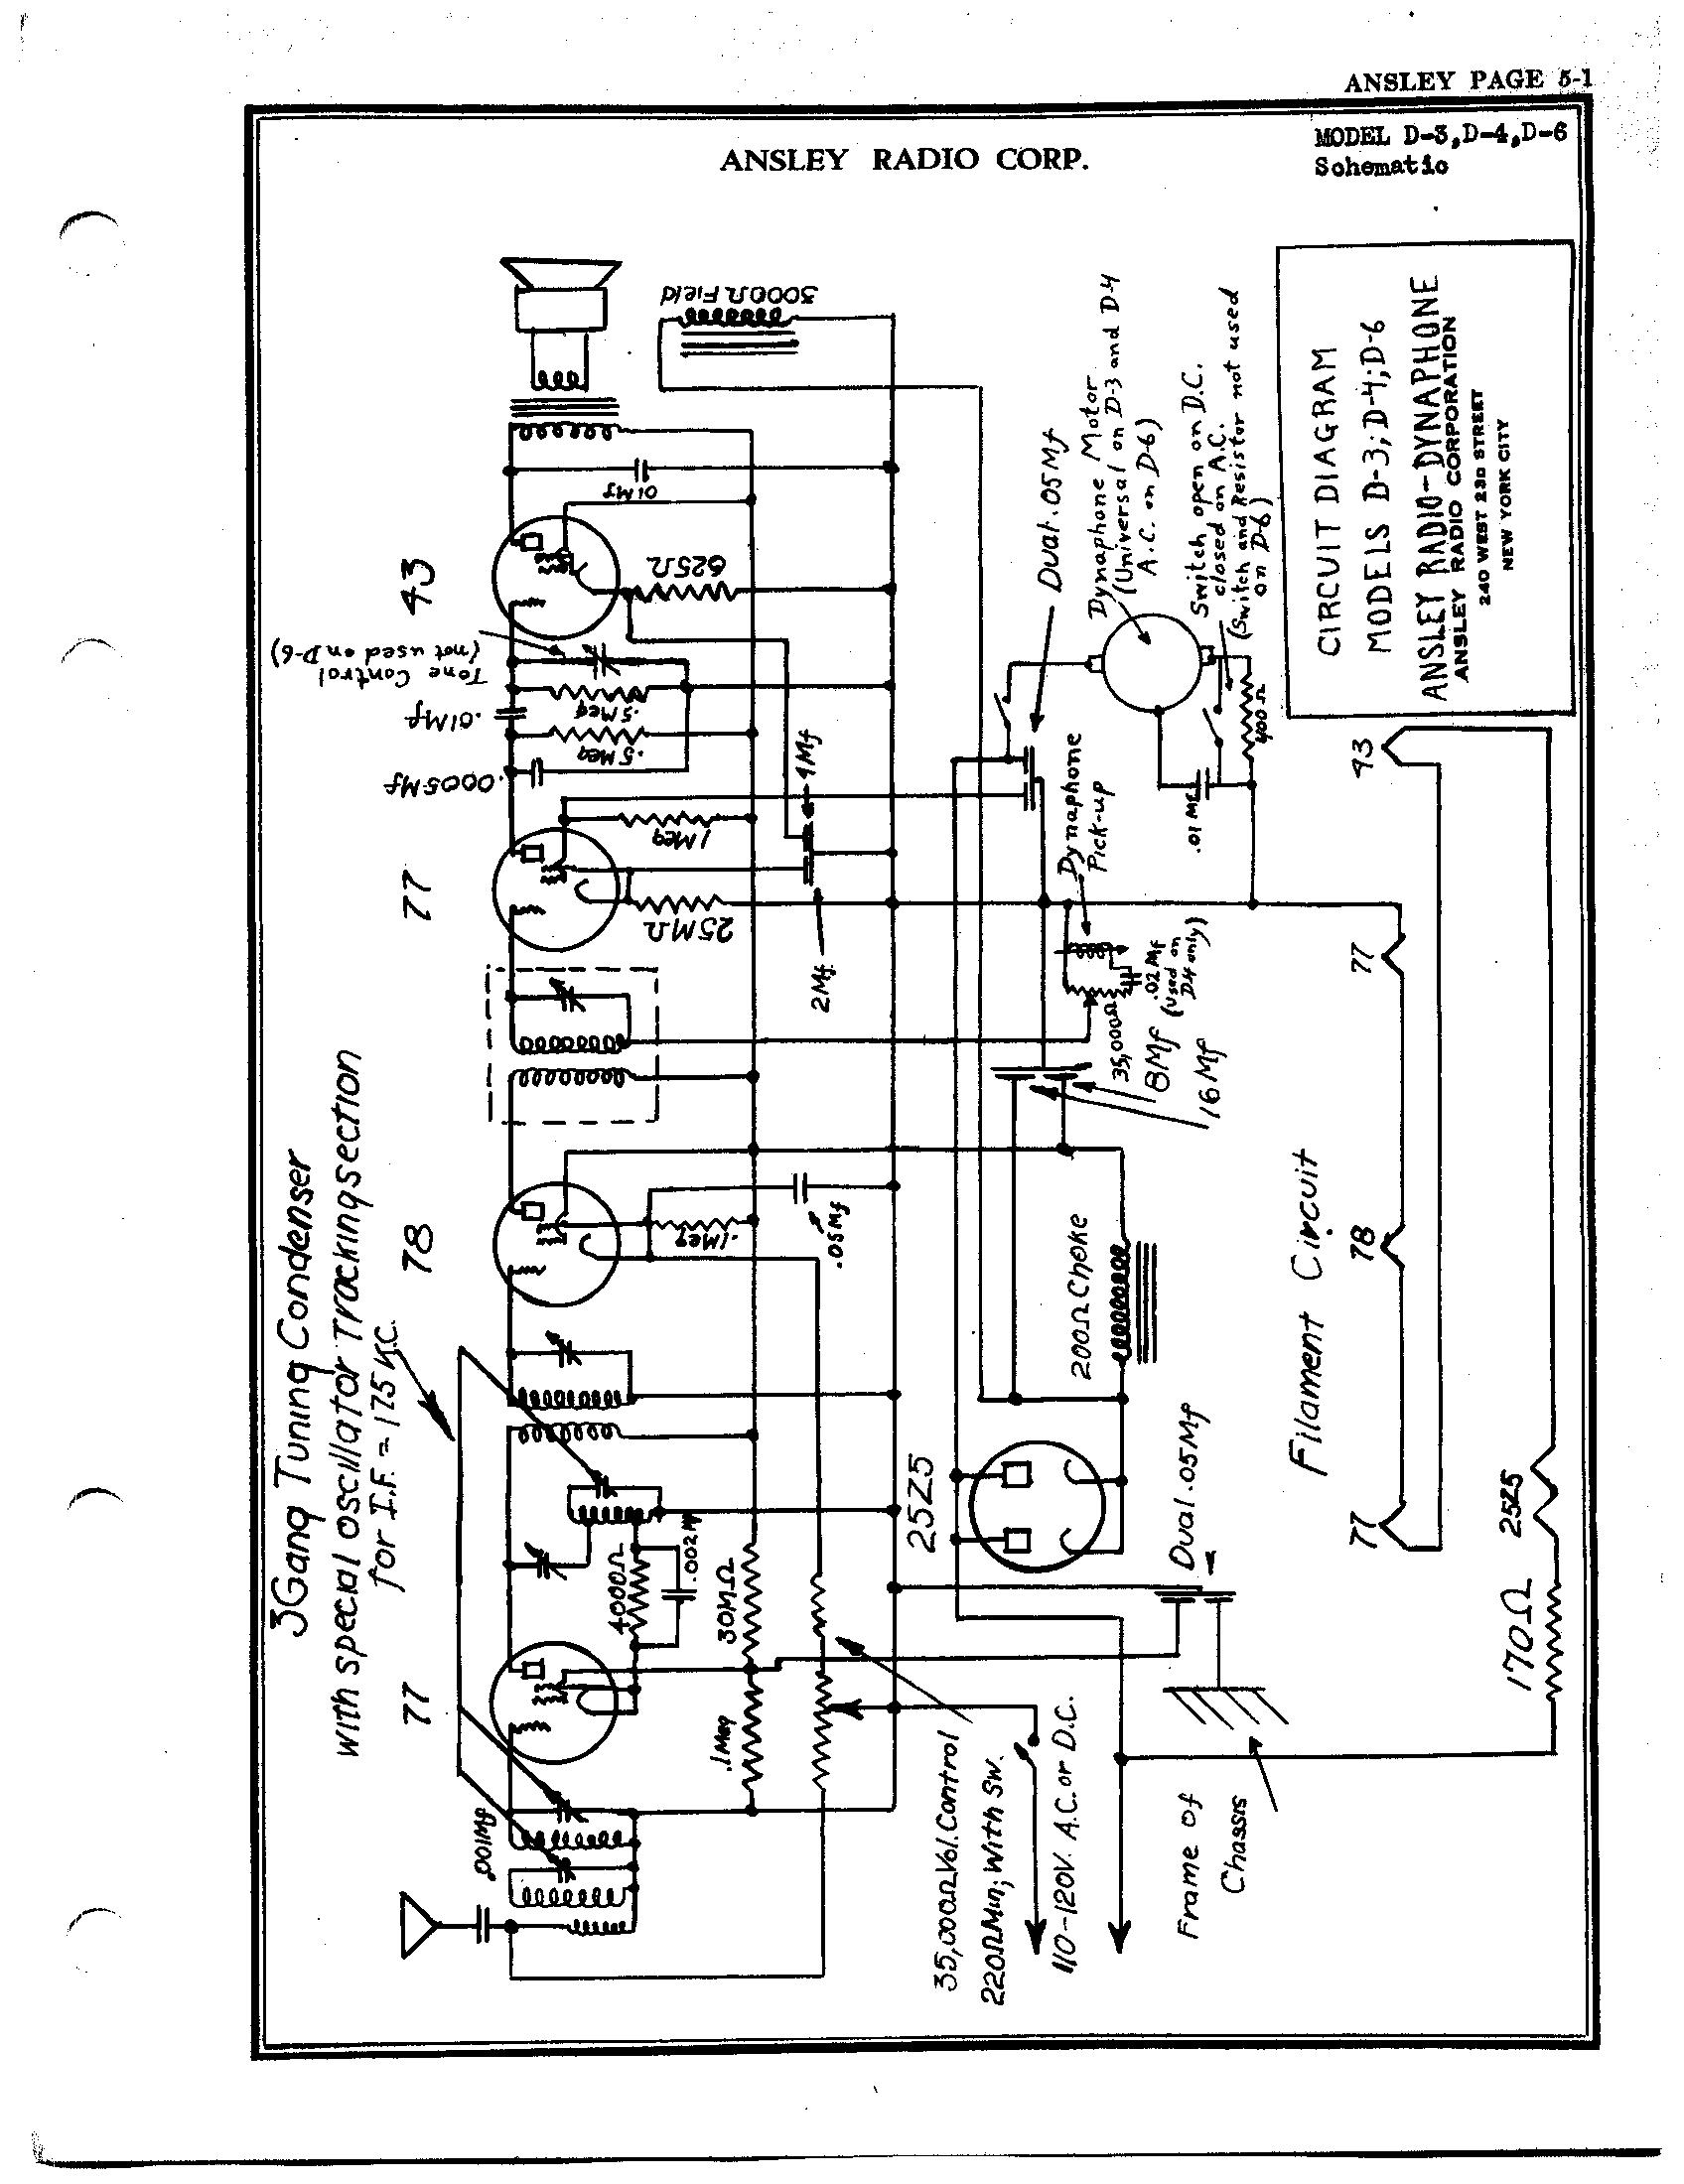 Ansley Radio Corp D 6